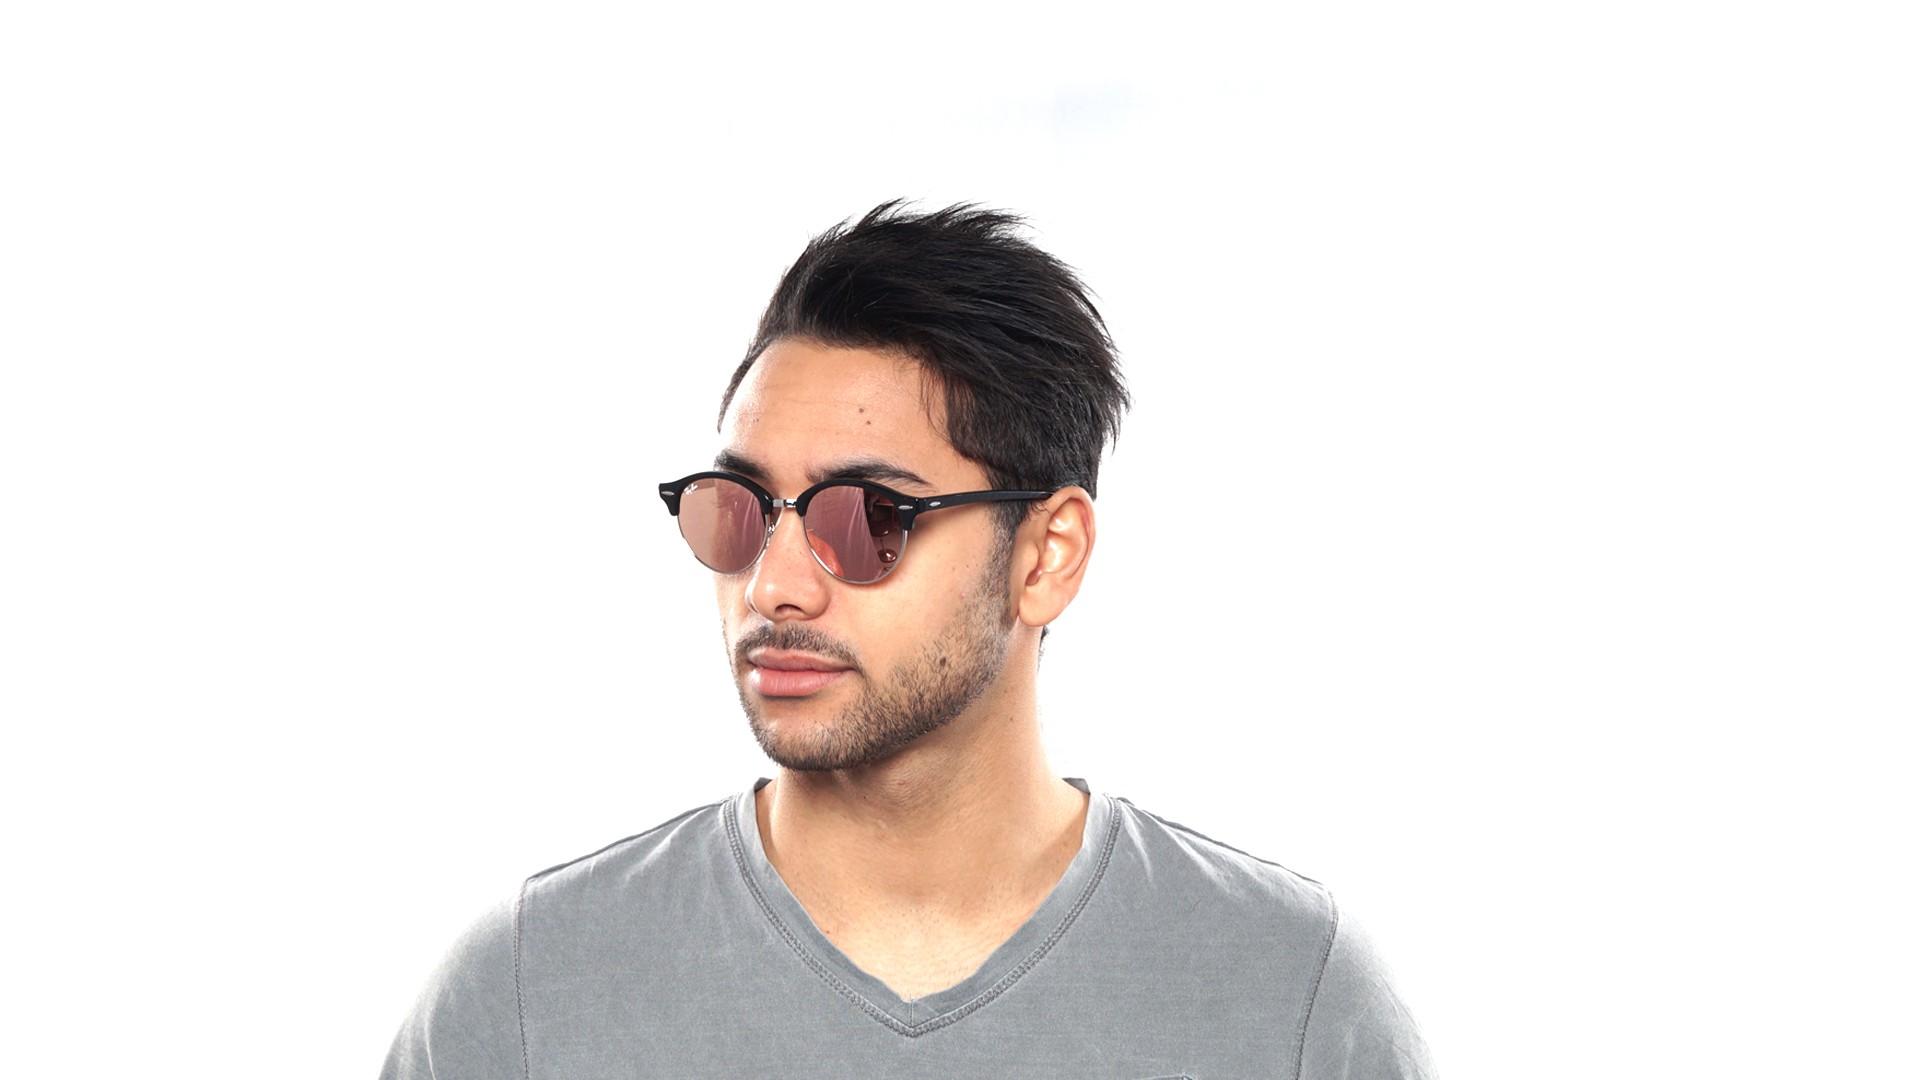 ff62e76b2be1 Sunglasses Ray-Ban Clubround Black Flash Lenses RB4246 1197Z2 51-19 Medium  Mirror